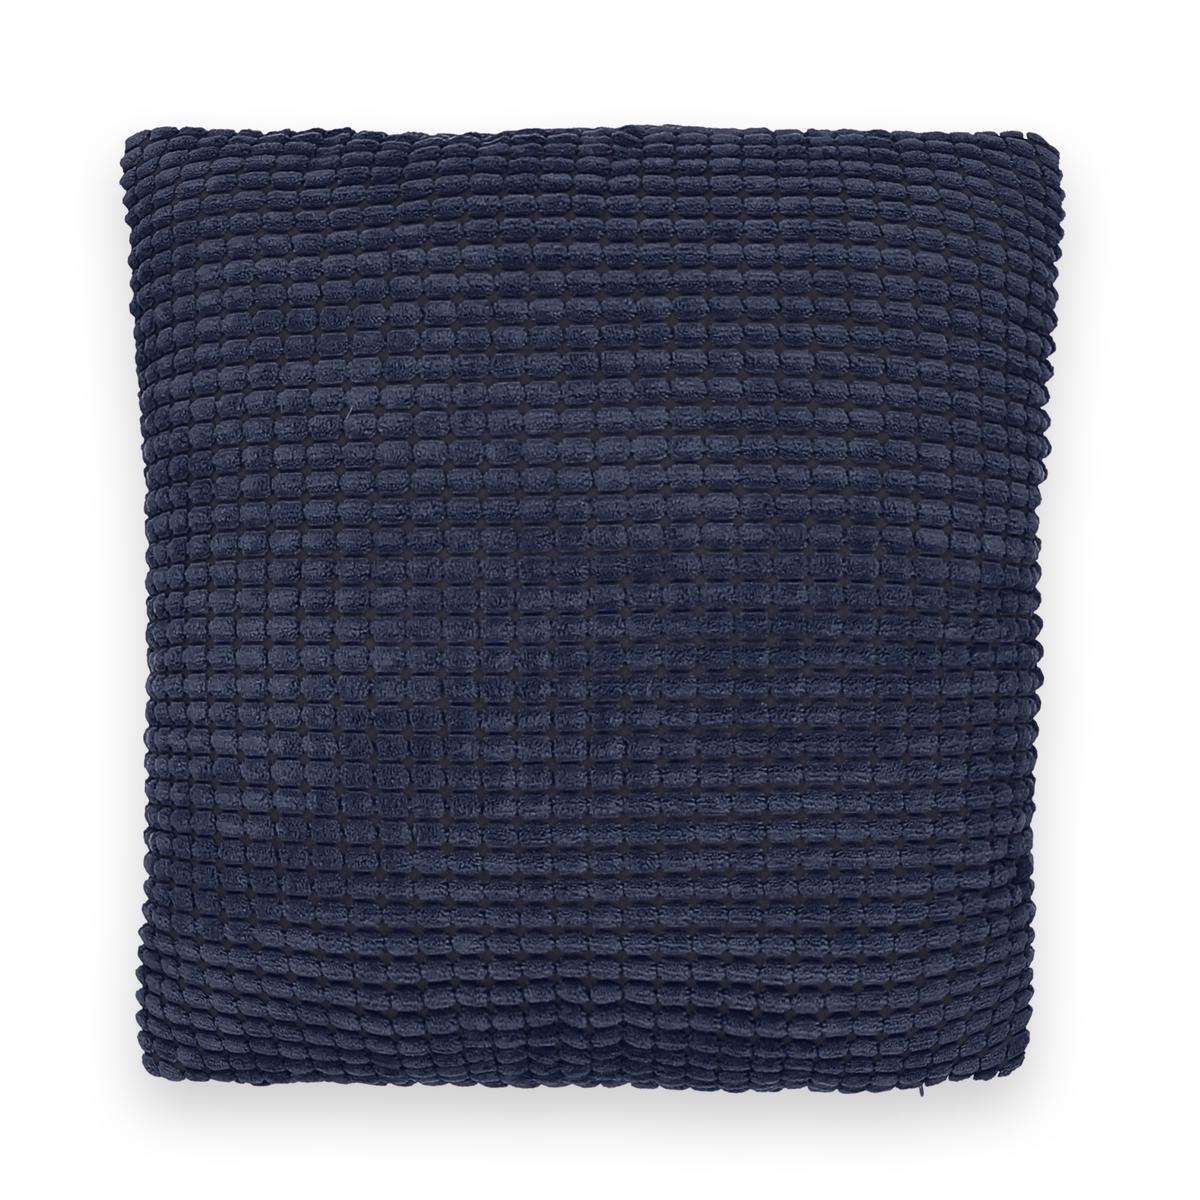 Чехол для подушки рельефный FLUFFY long middle part fluffy curly synthetic lace front wig